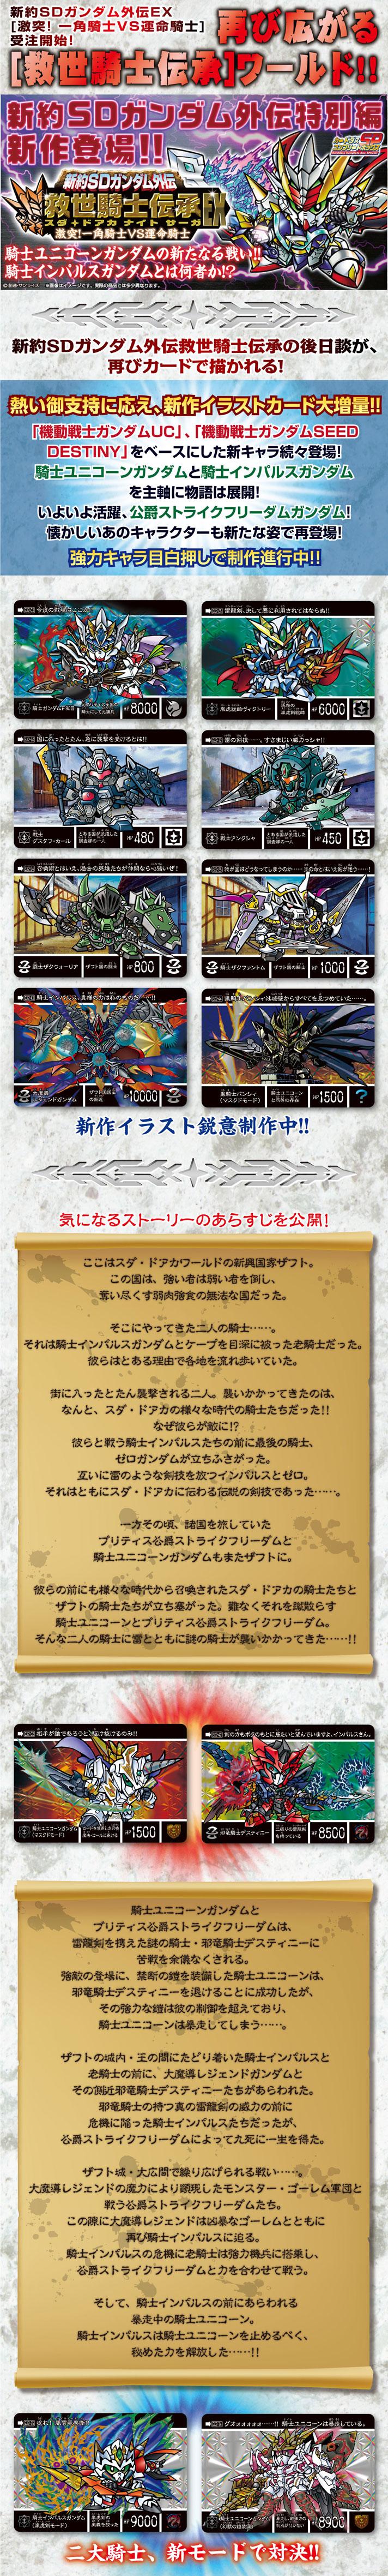 【抽選販売】新約SDガンダム外伝 救世騎士伝承EX 激突! 一角騎士VS運命騎士